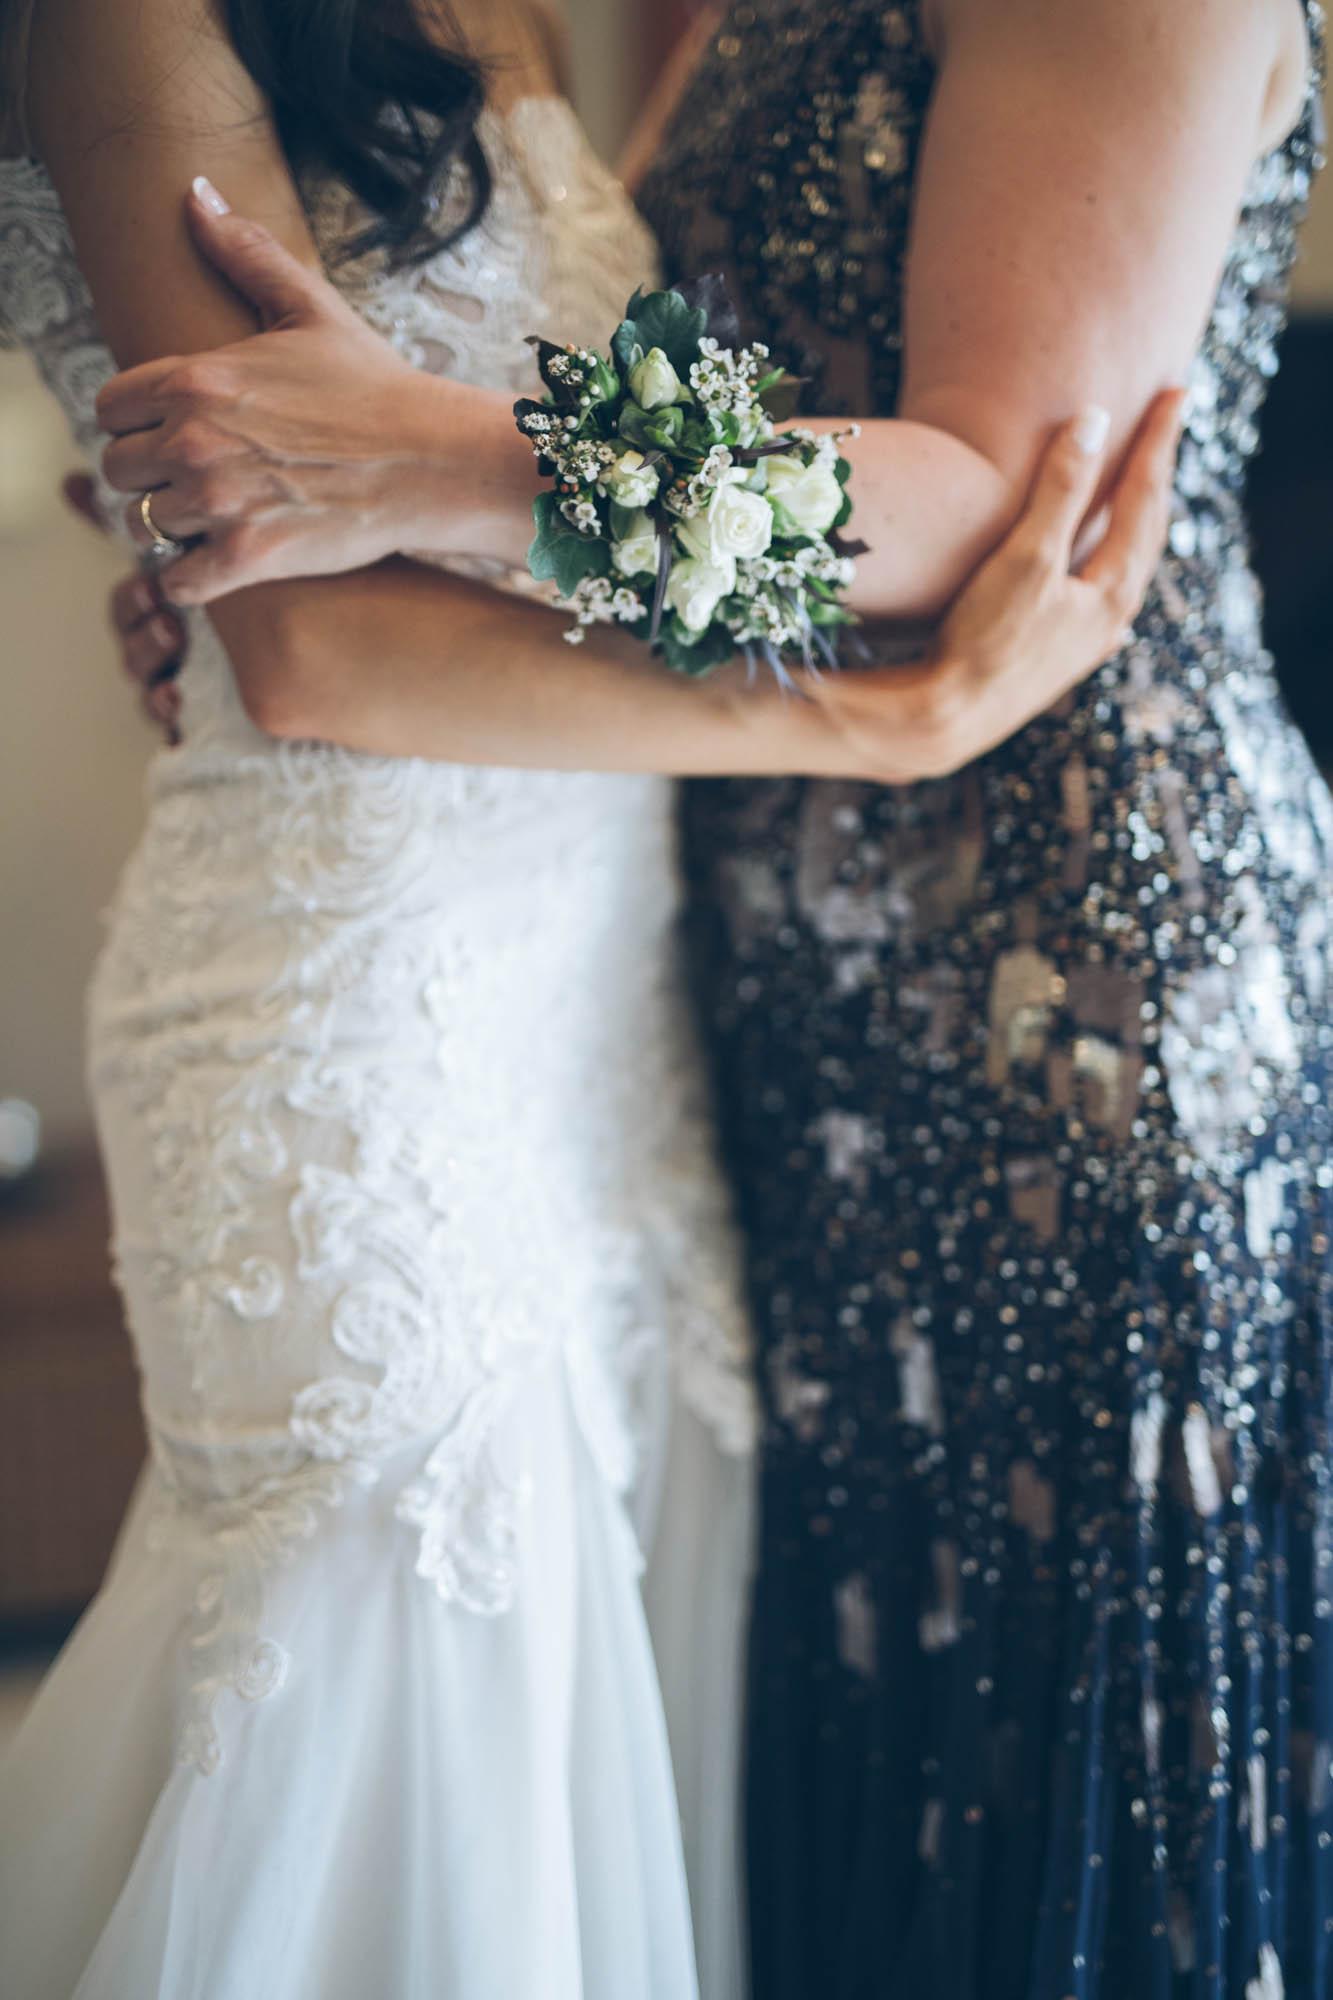 MacDougall-Photography-Sydney-Wedding-Photographers-5.jpg